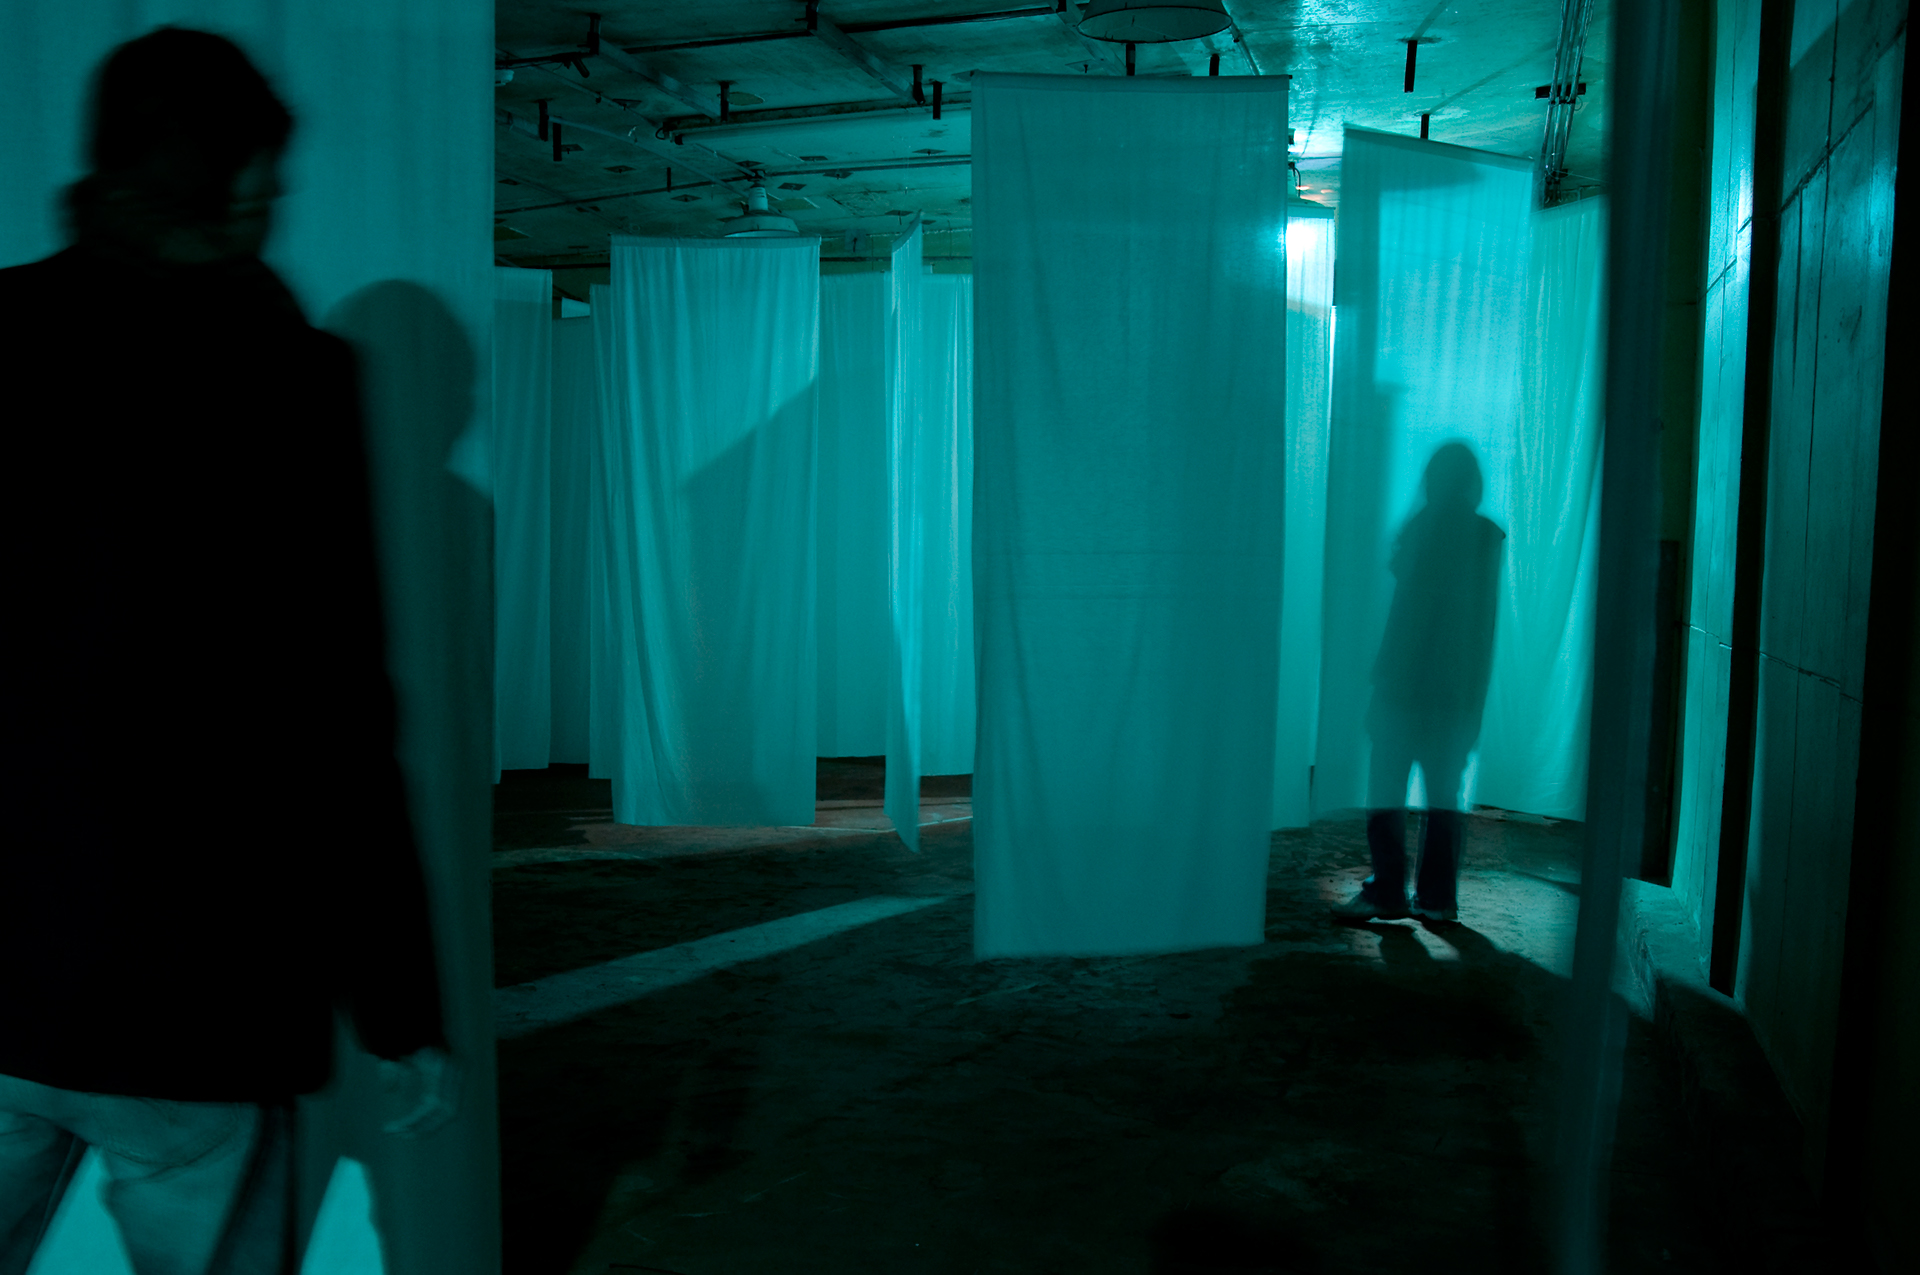 Multiple participants could enter the space.